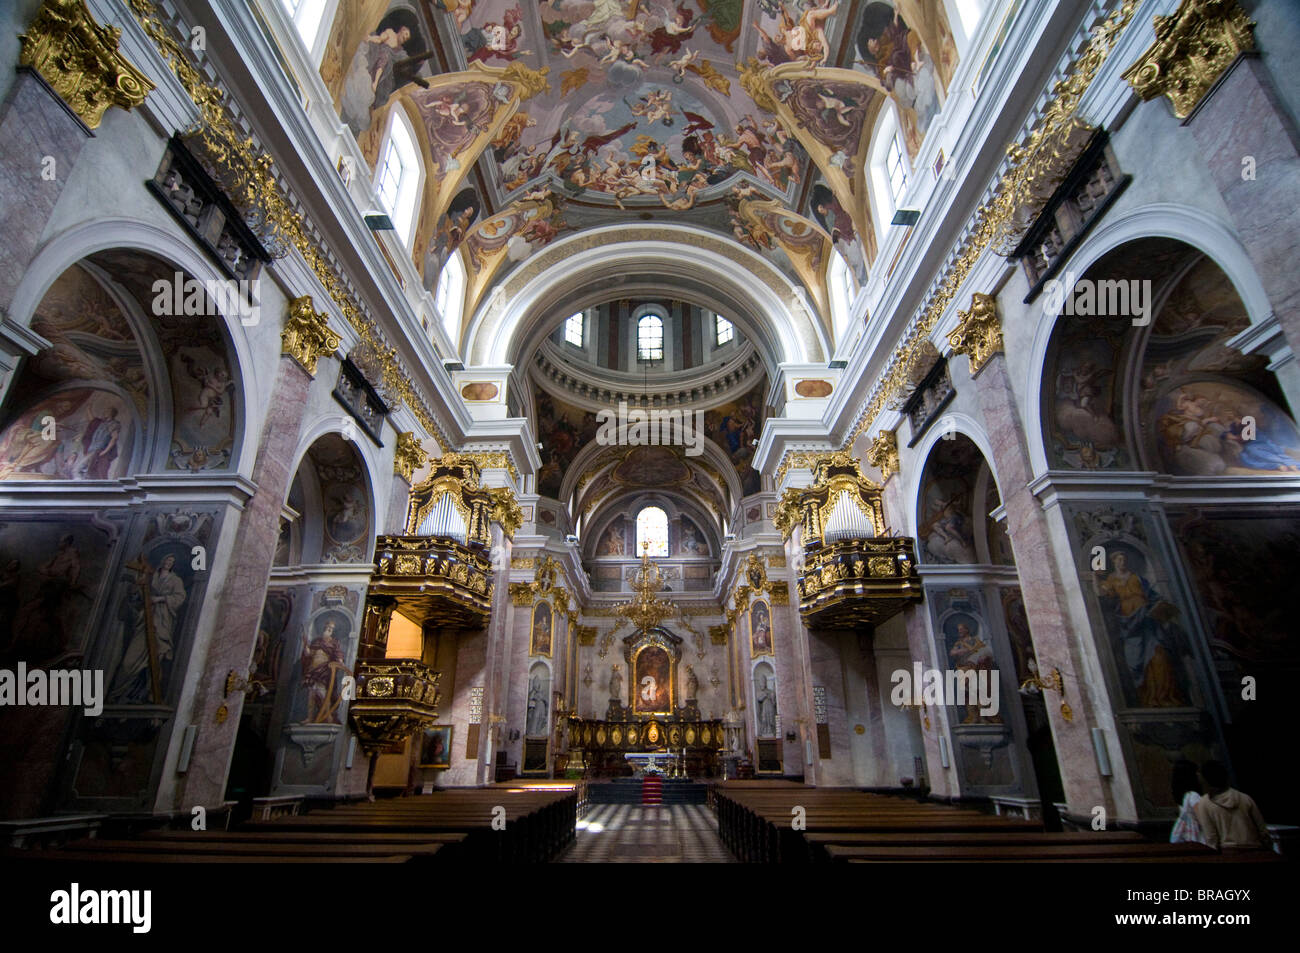 Großartige Innere der Kirche, Ljubljana, Slowenien, Europa Stockbild